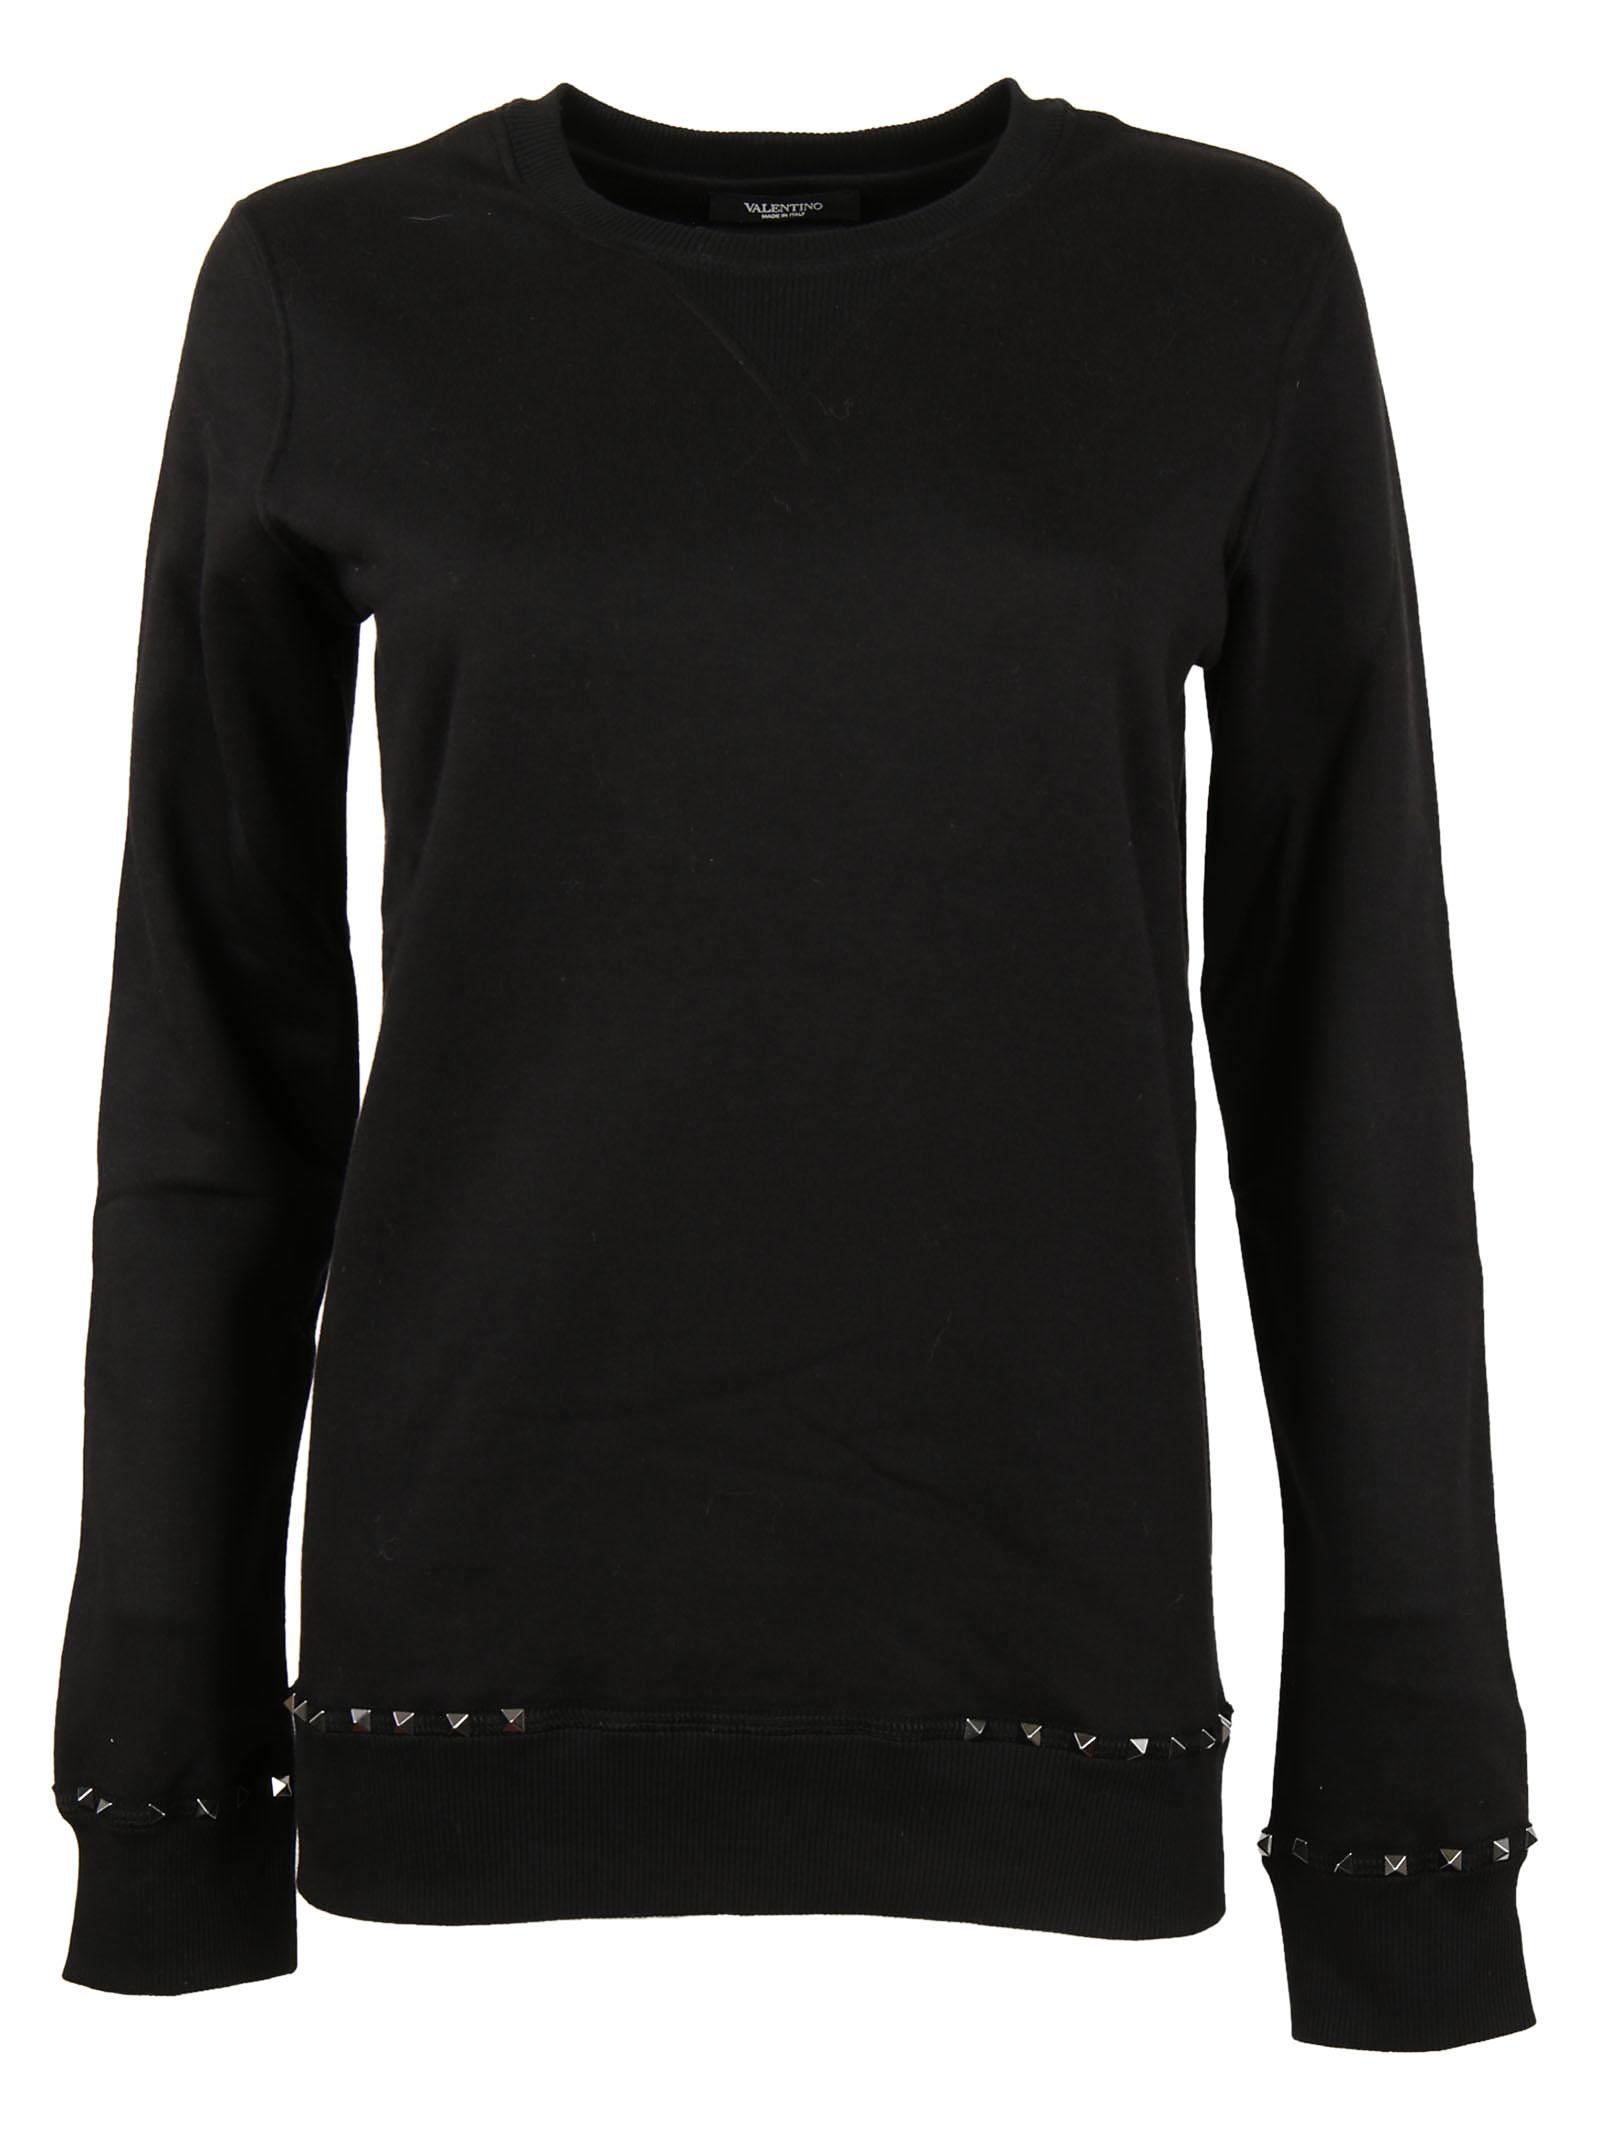 Valentino Valentino Rockstud Sweater